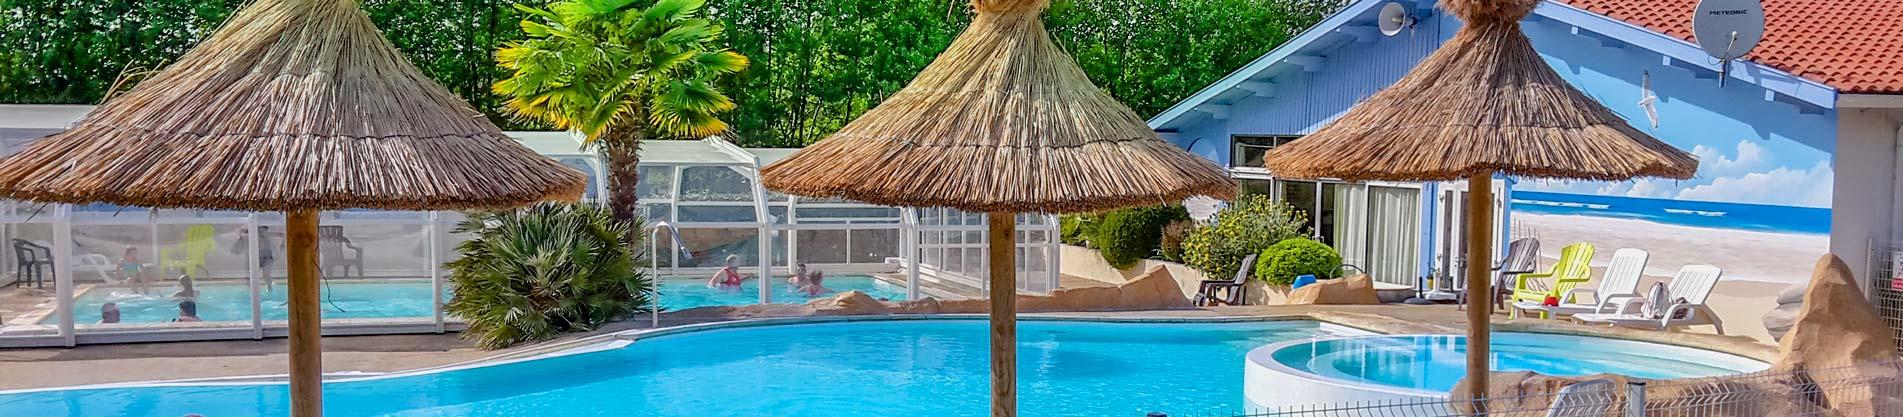 camping piscine tarifs landes